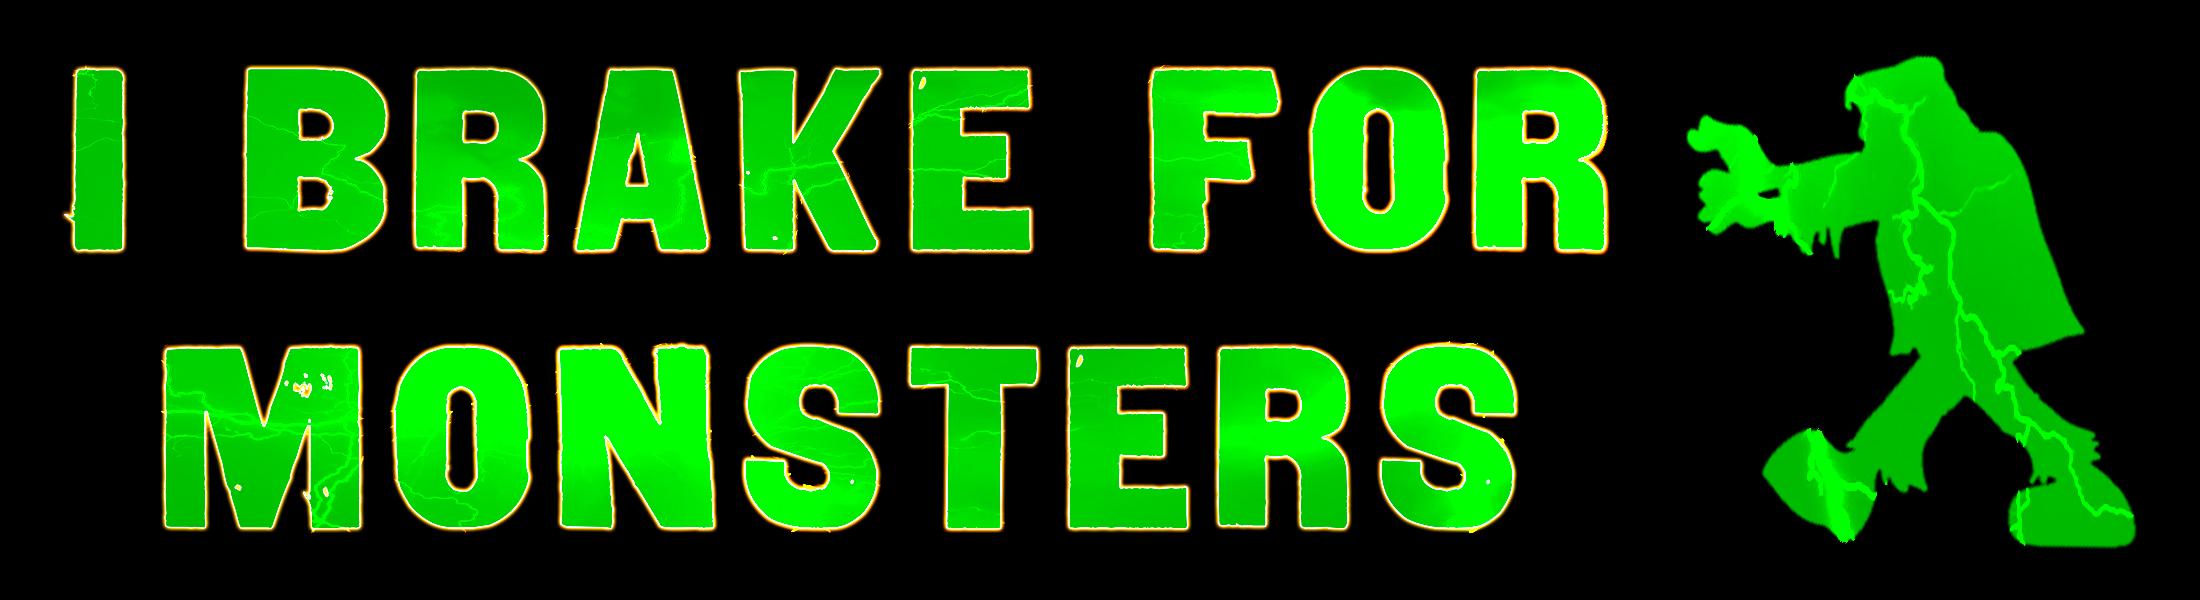 Monster Kid Radio Broken Glass Circuit Board Iphone 5 Cases Zazzle Https Com I Brake For Monsters Bumper Sticker 128268425862020319